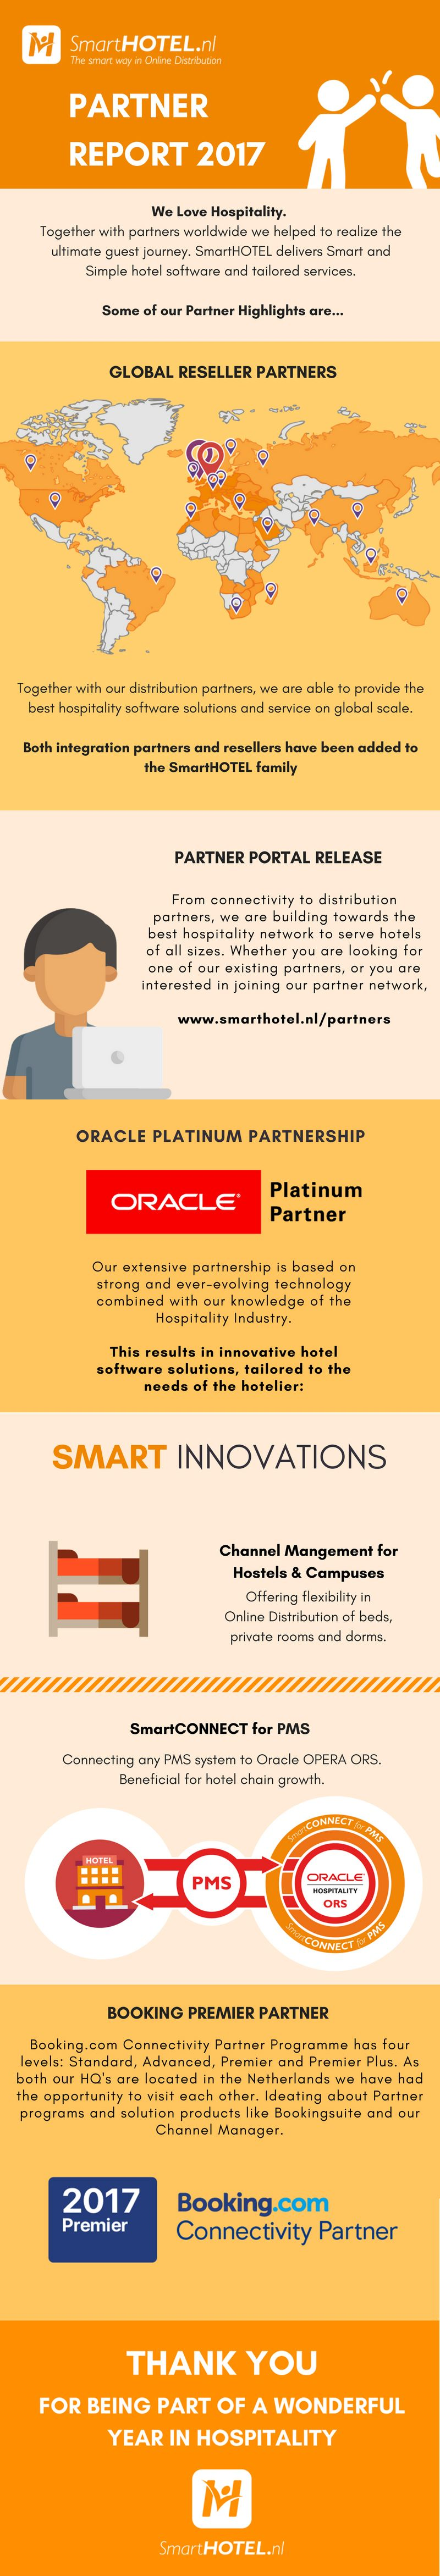 SmartHOTEL Partner Overview 2017